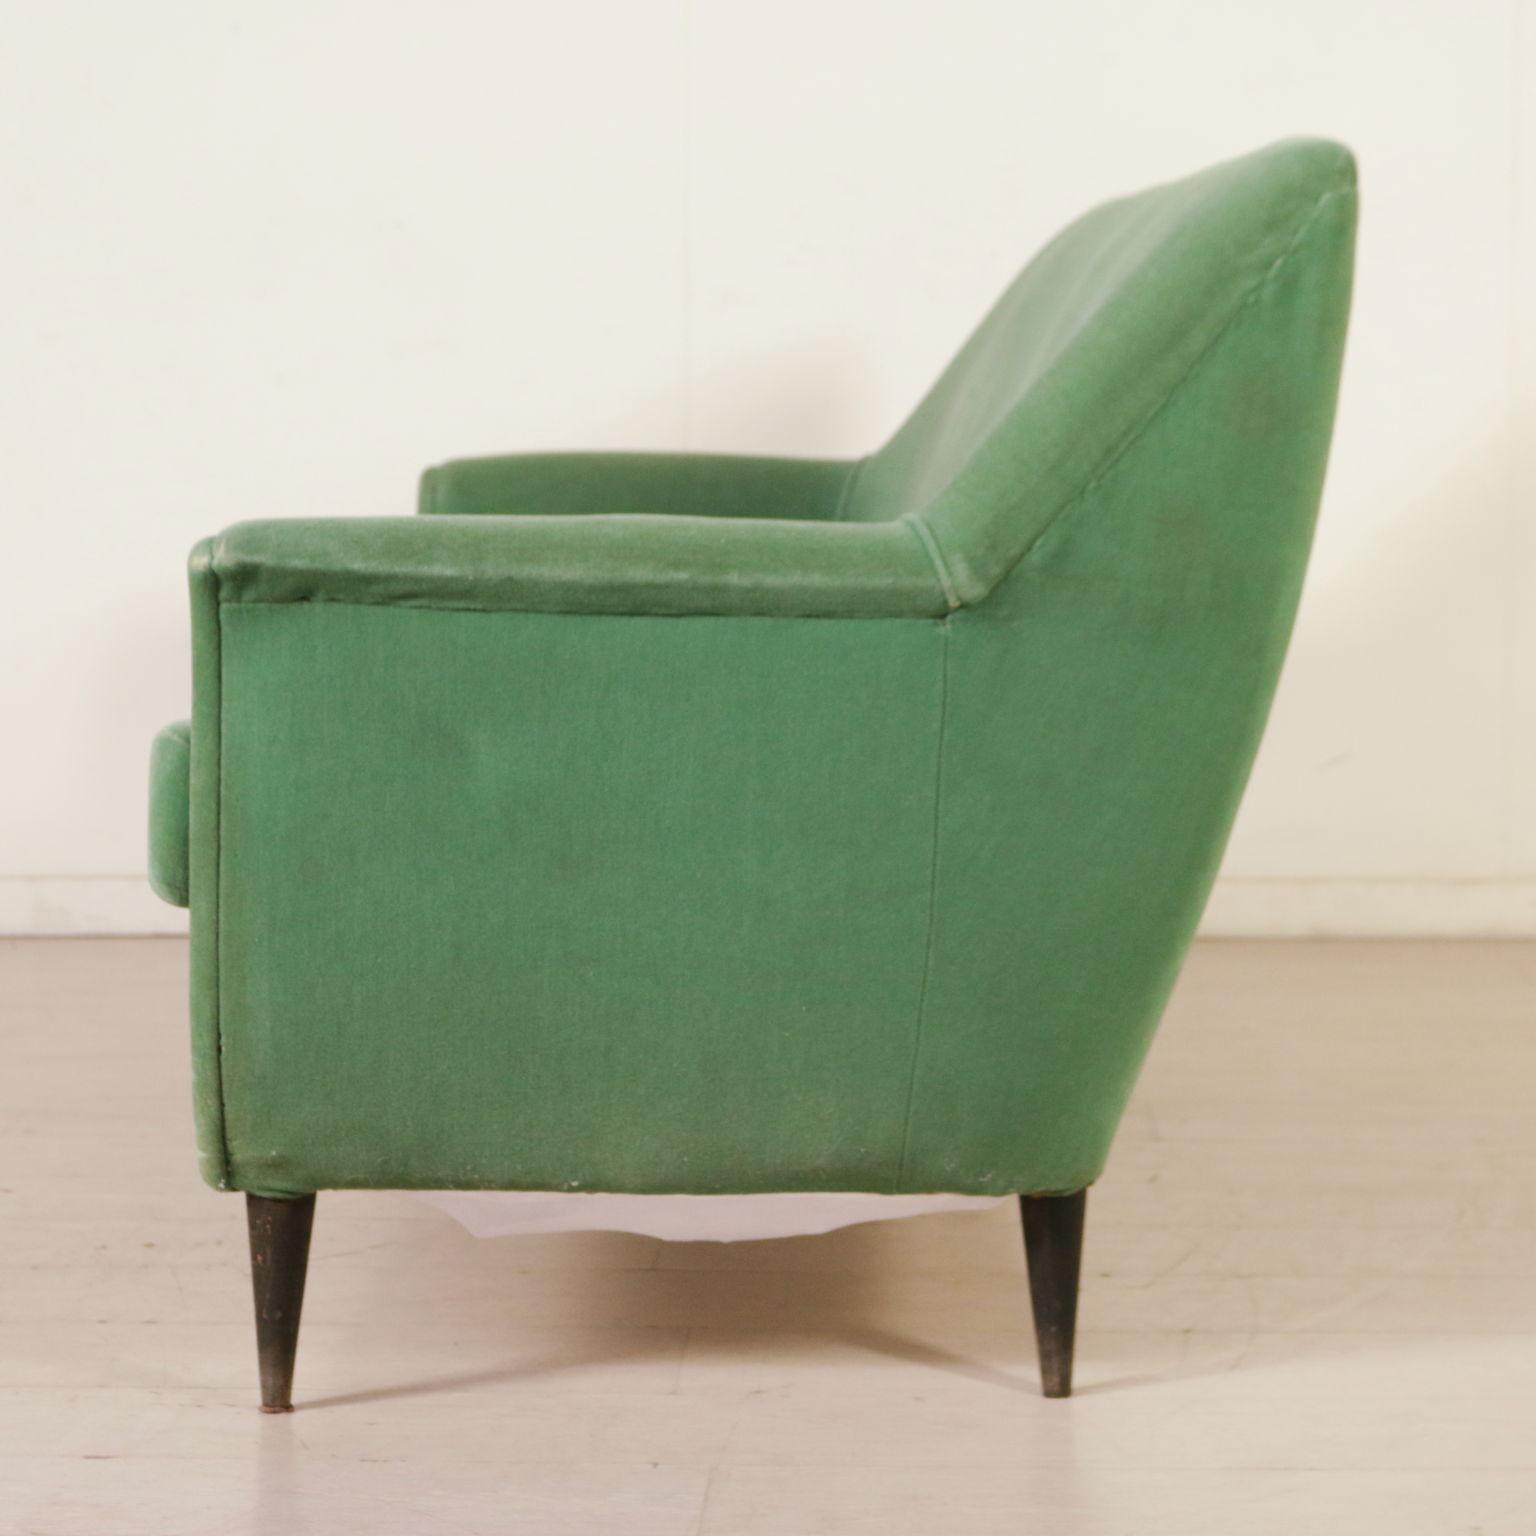 Sofa 50er und 60er jahren sofas modernes design for Sofa 50er 60er